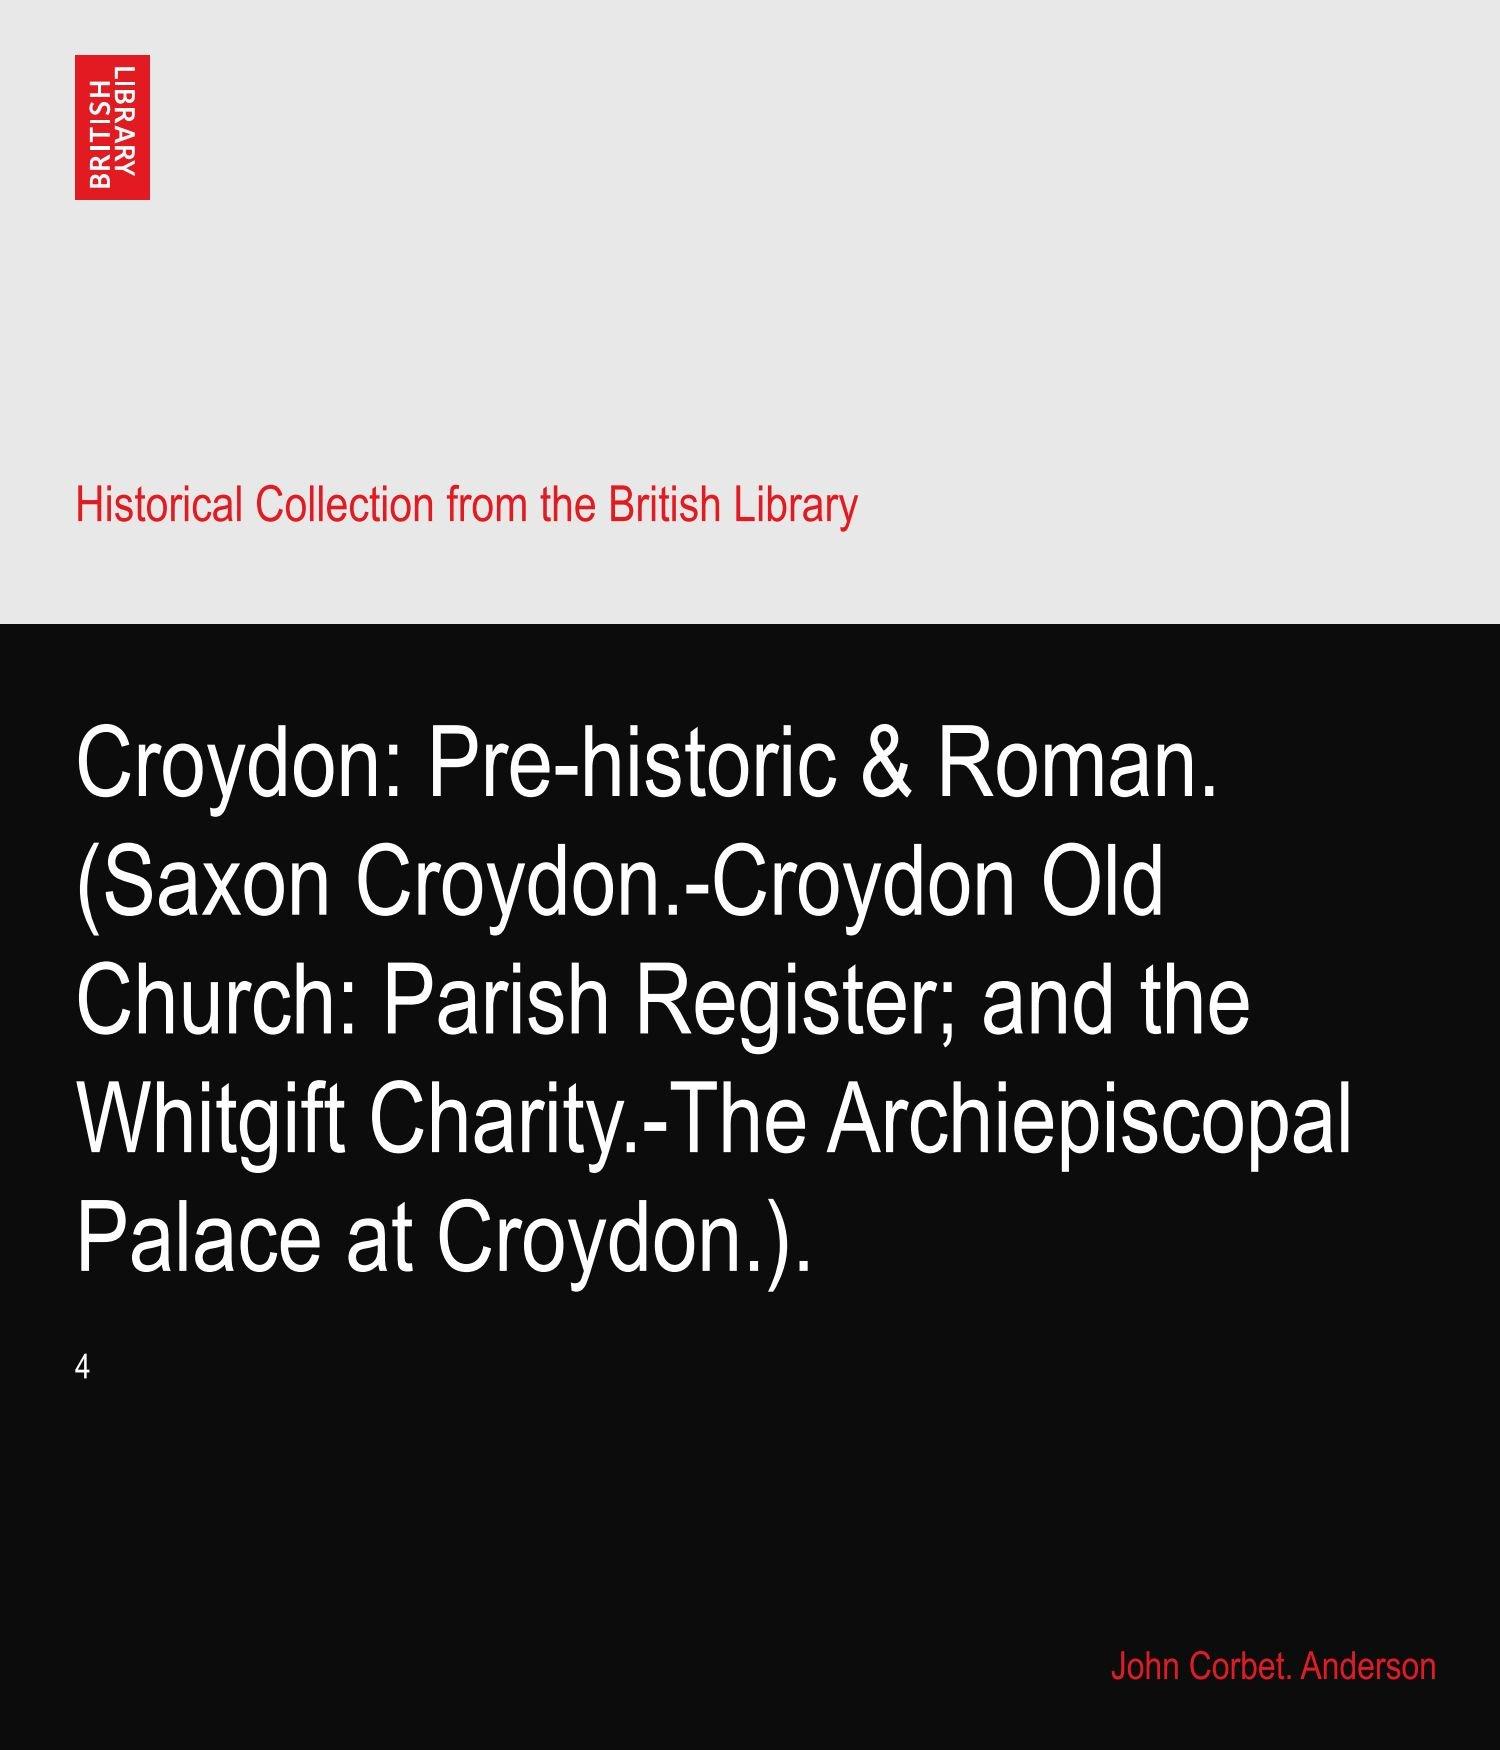 Croydon: Pre-historic & Roman. (Saxon Croydon.-Croydon Old Church: Parish Register; and the Whitgift Charity.-The Archiepiscopal Palace at Croydon.).: 4 pdf